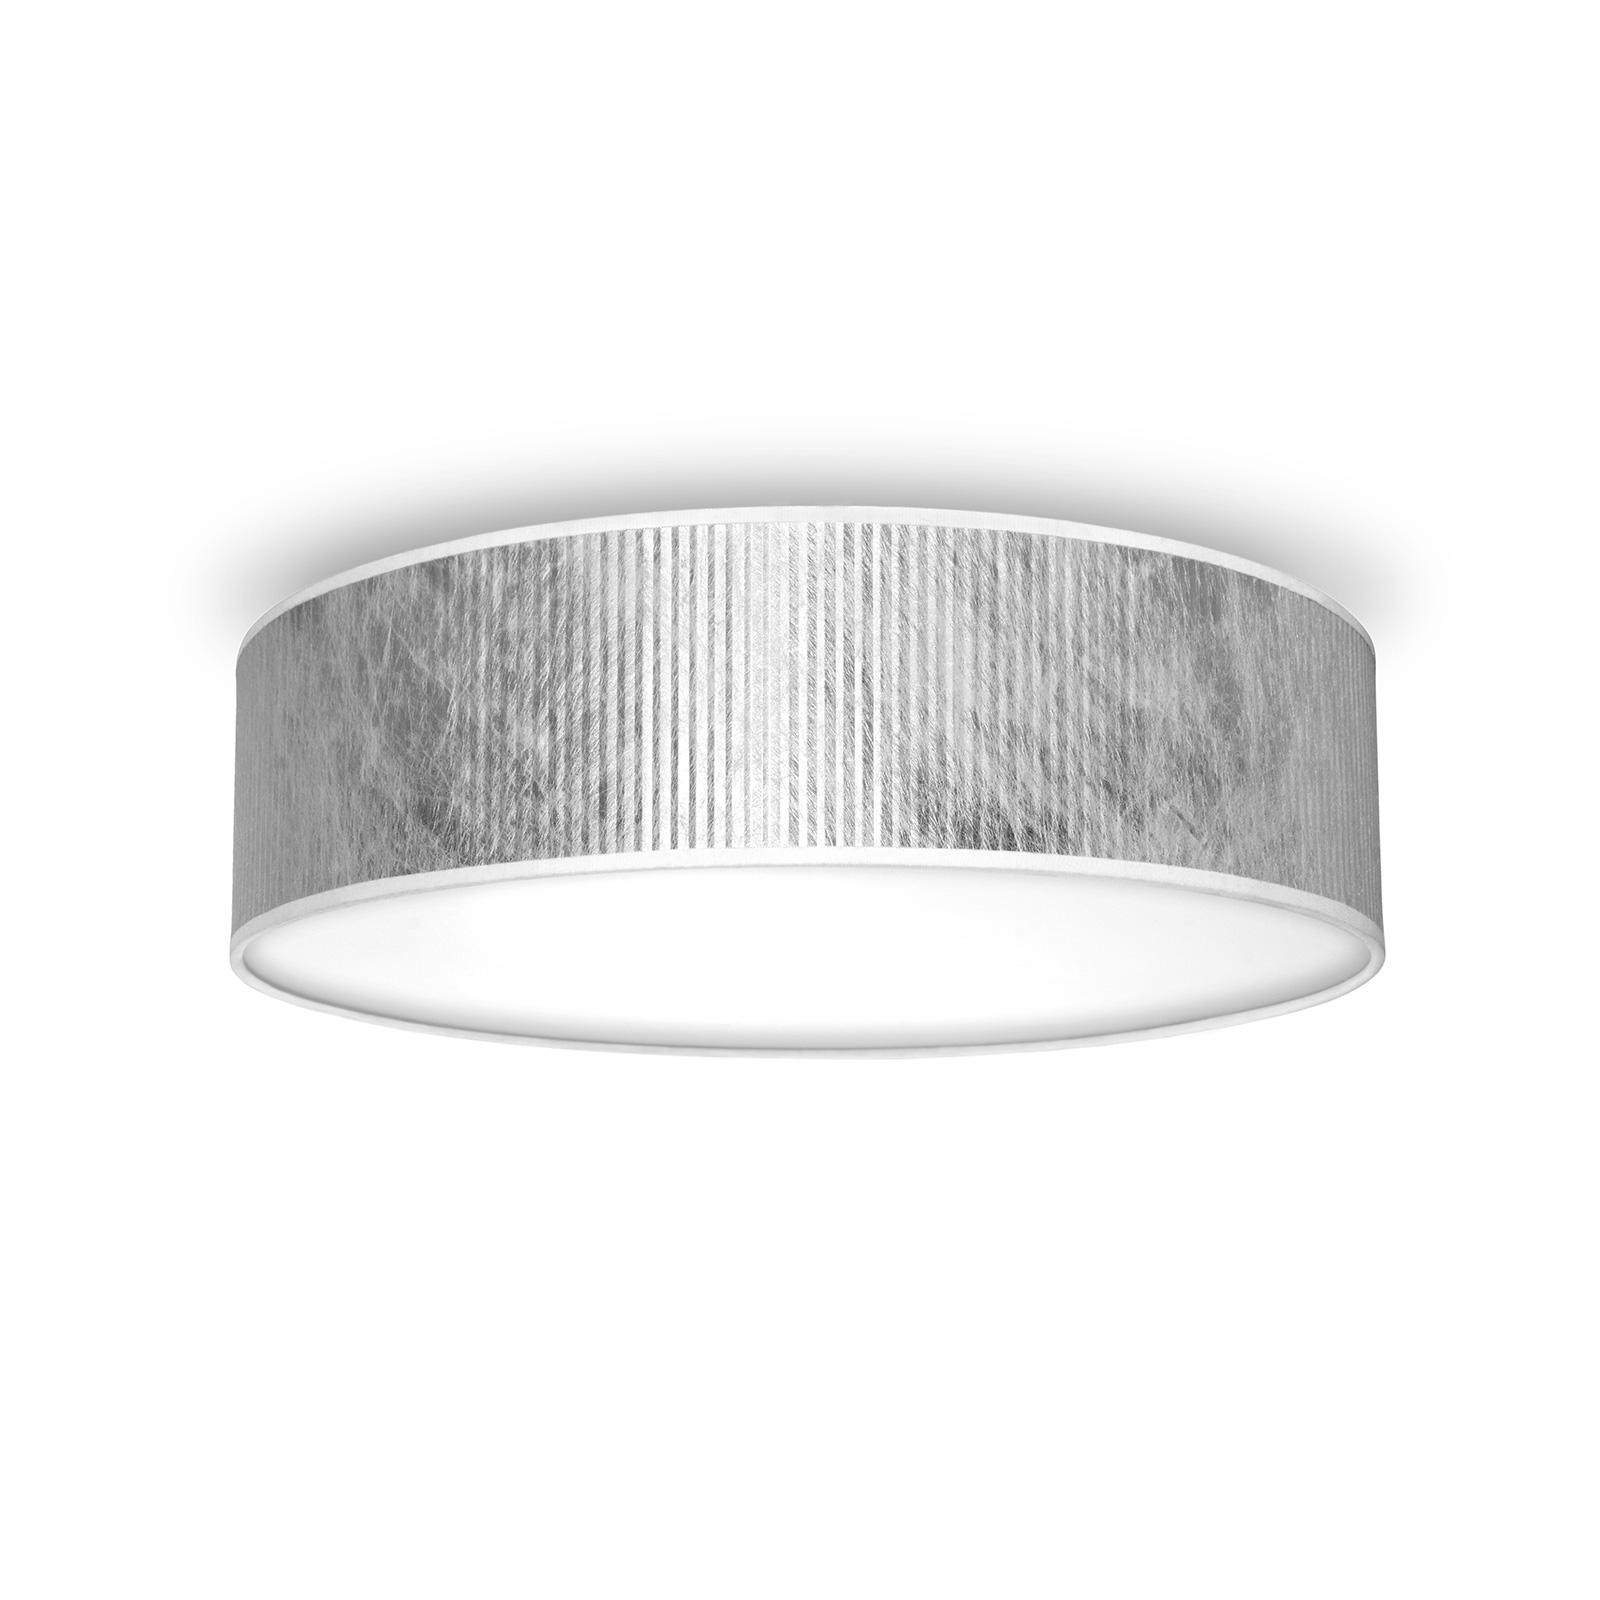 Tres Plisados L taklampe, Ø 40 cm, sølv